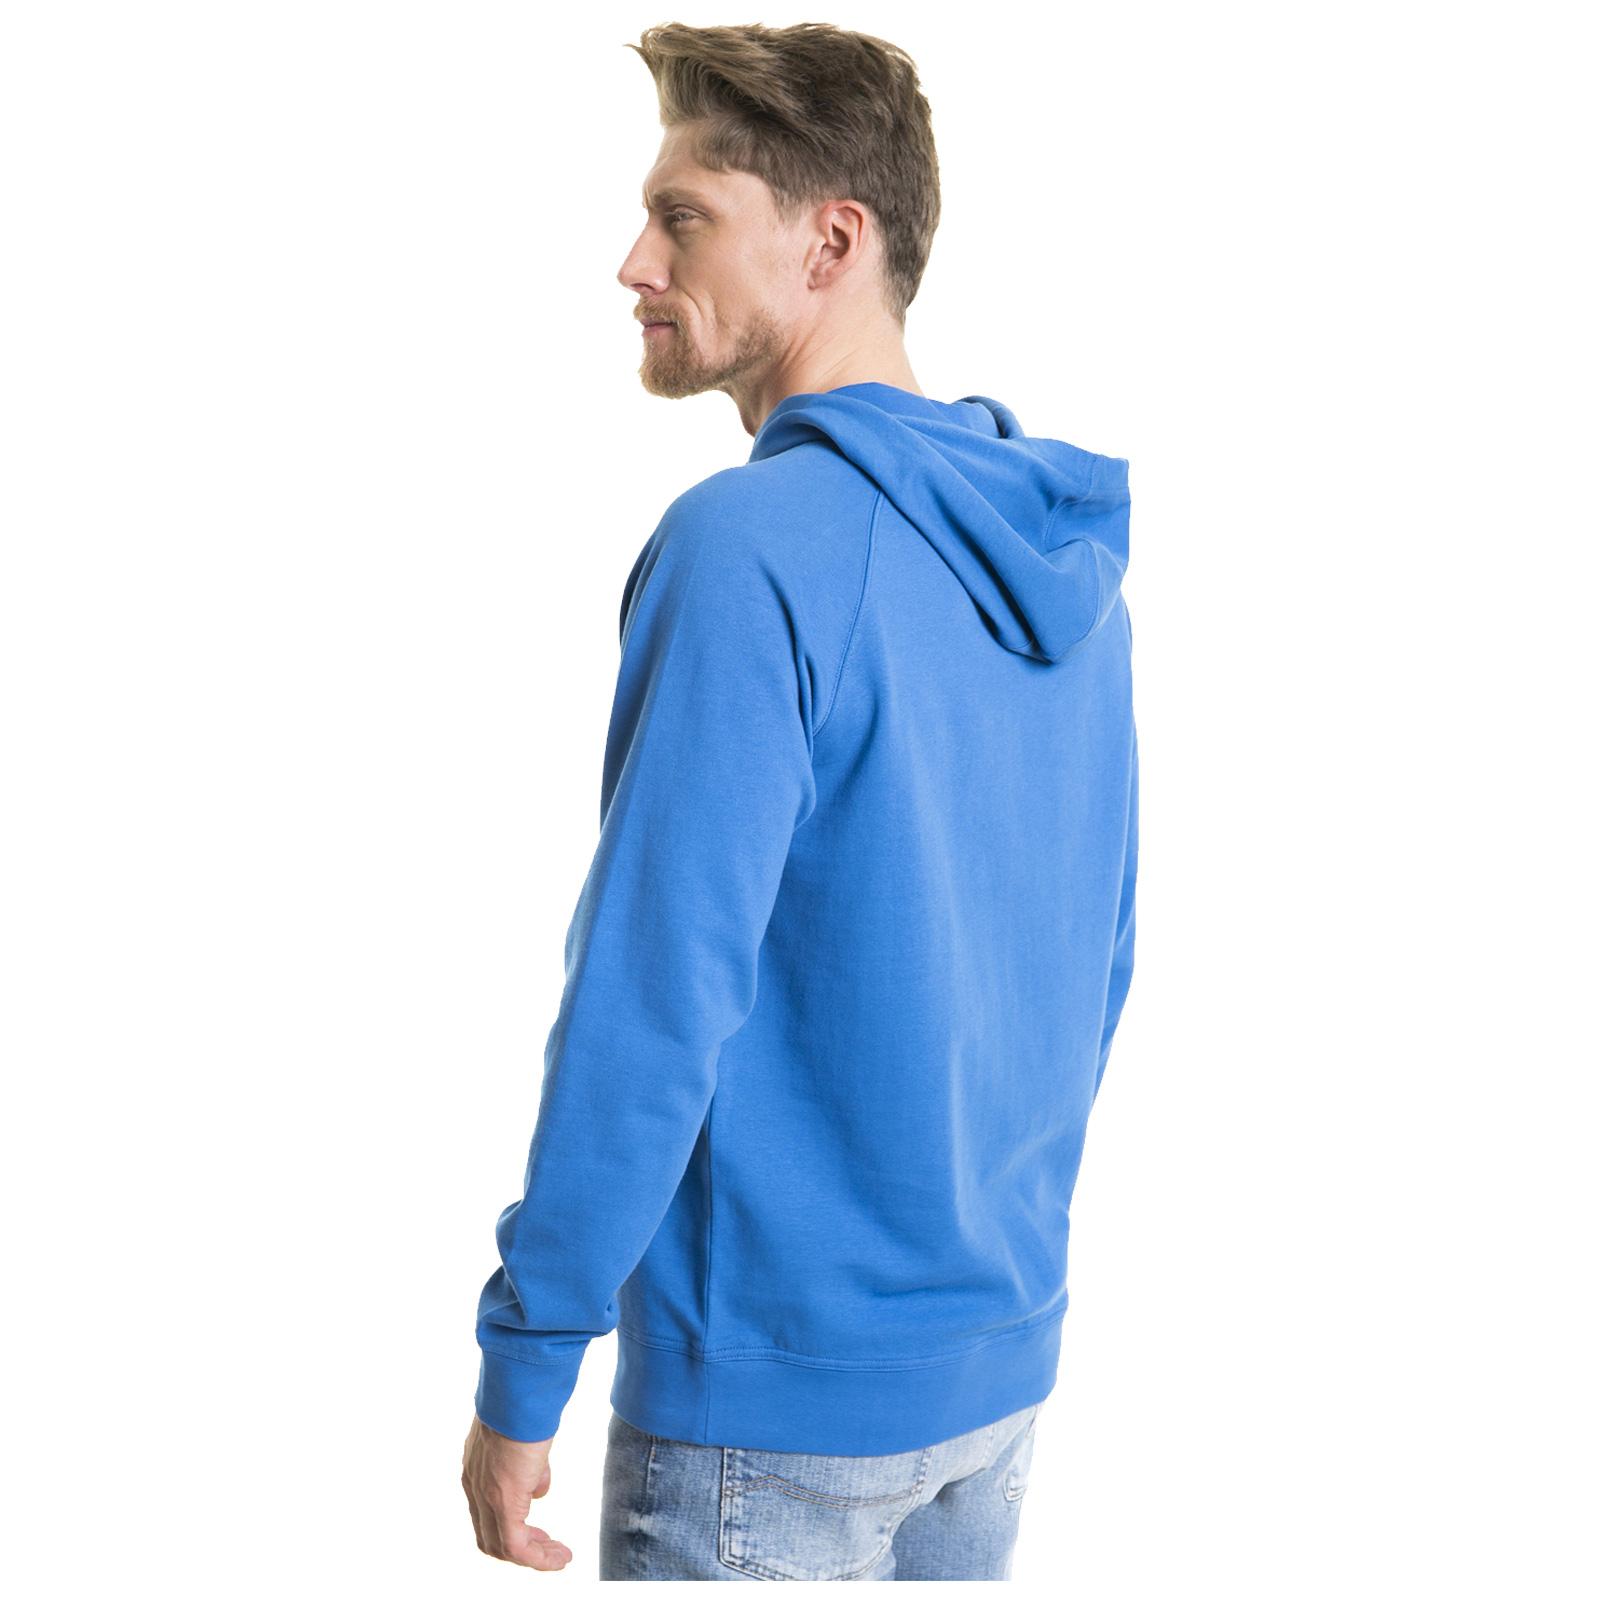 Big-Star-Mens-Hoodie-New-Cotton-Pullover-Full-Zip-Hooded-Casual-Sweatshirt thumbnail 3